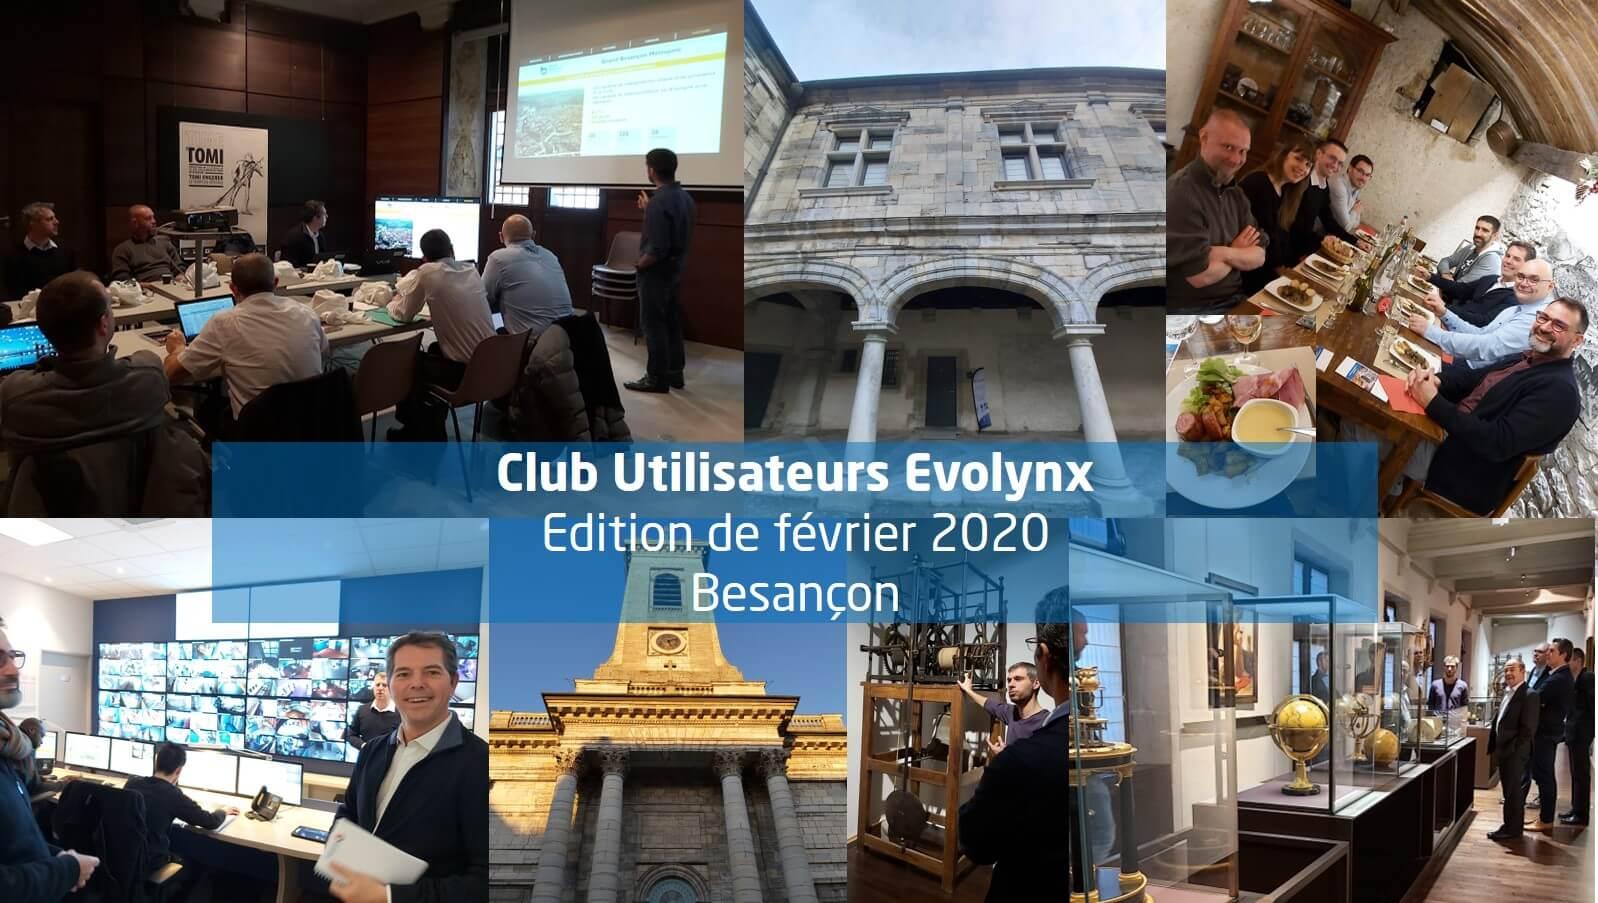 Secure Systems - Club utilisateurs Evolynx